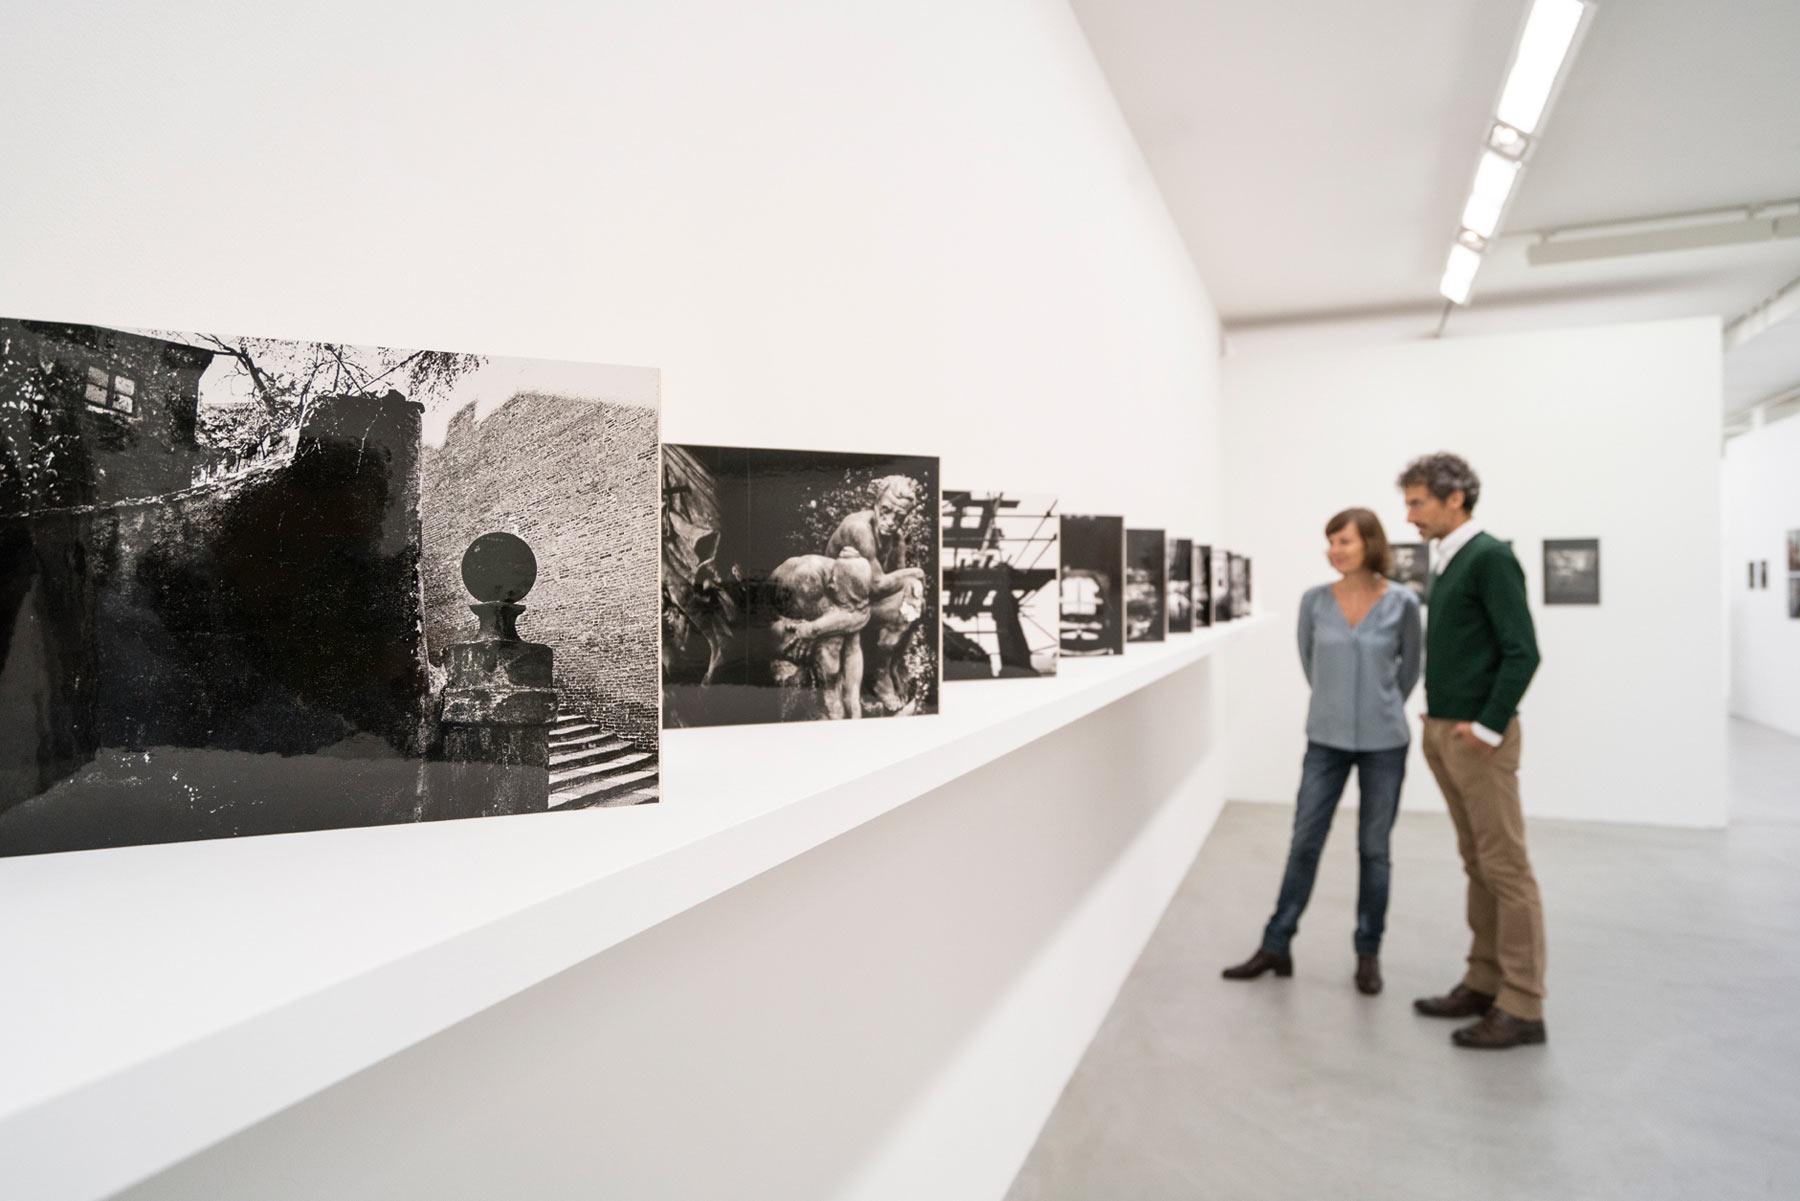 Center for Photography, Winterthur